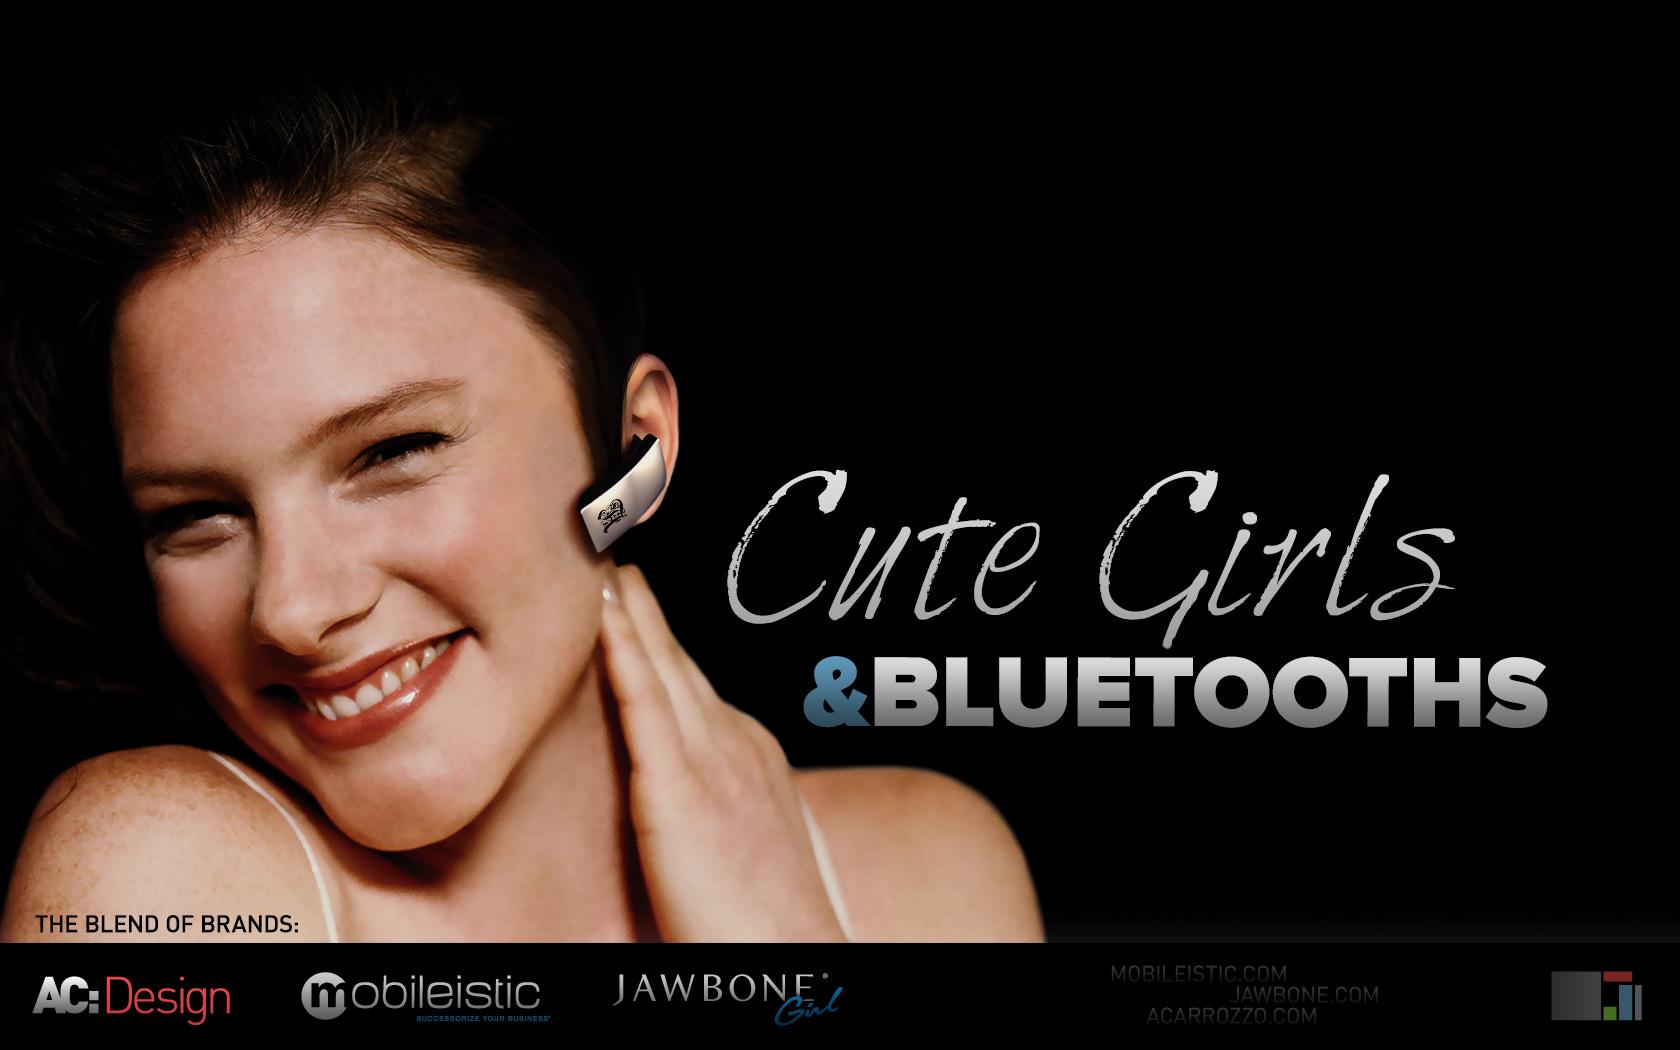 acarrozzo_wallpaper_2011_cute_girl_bluetooth